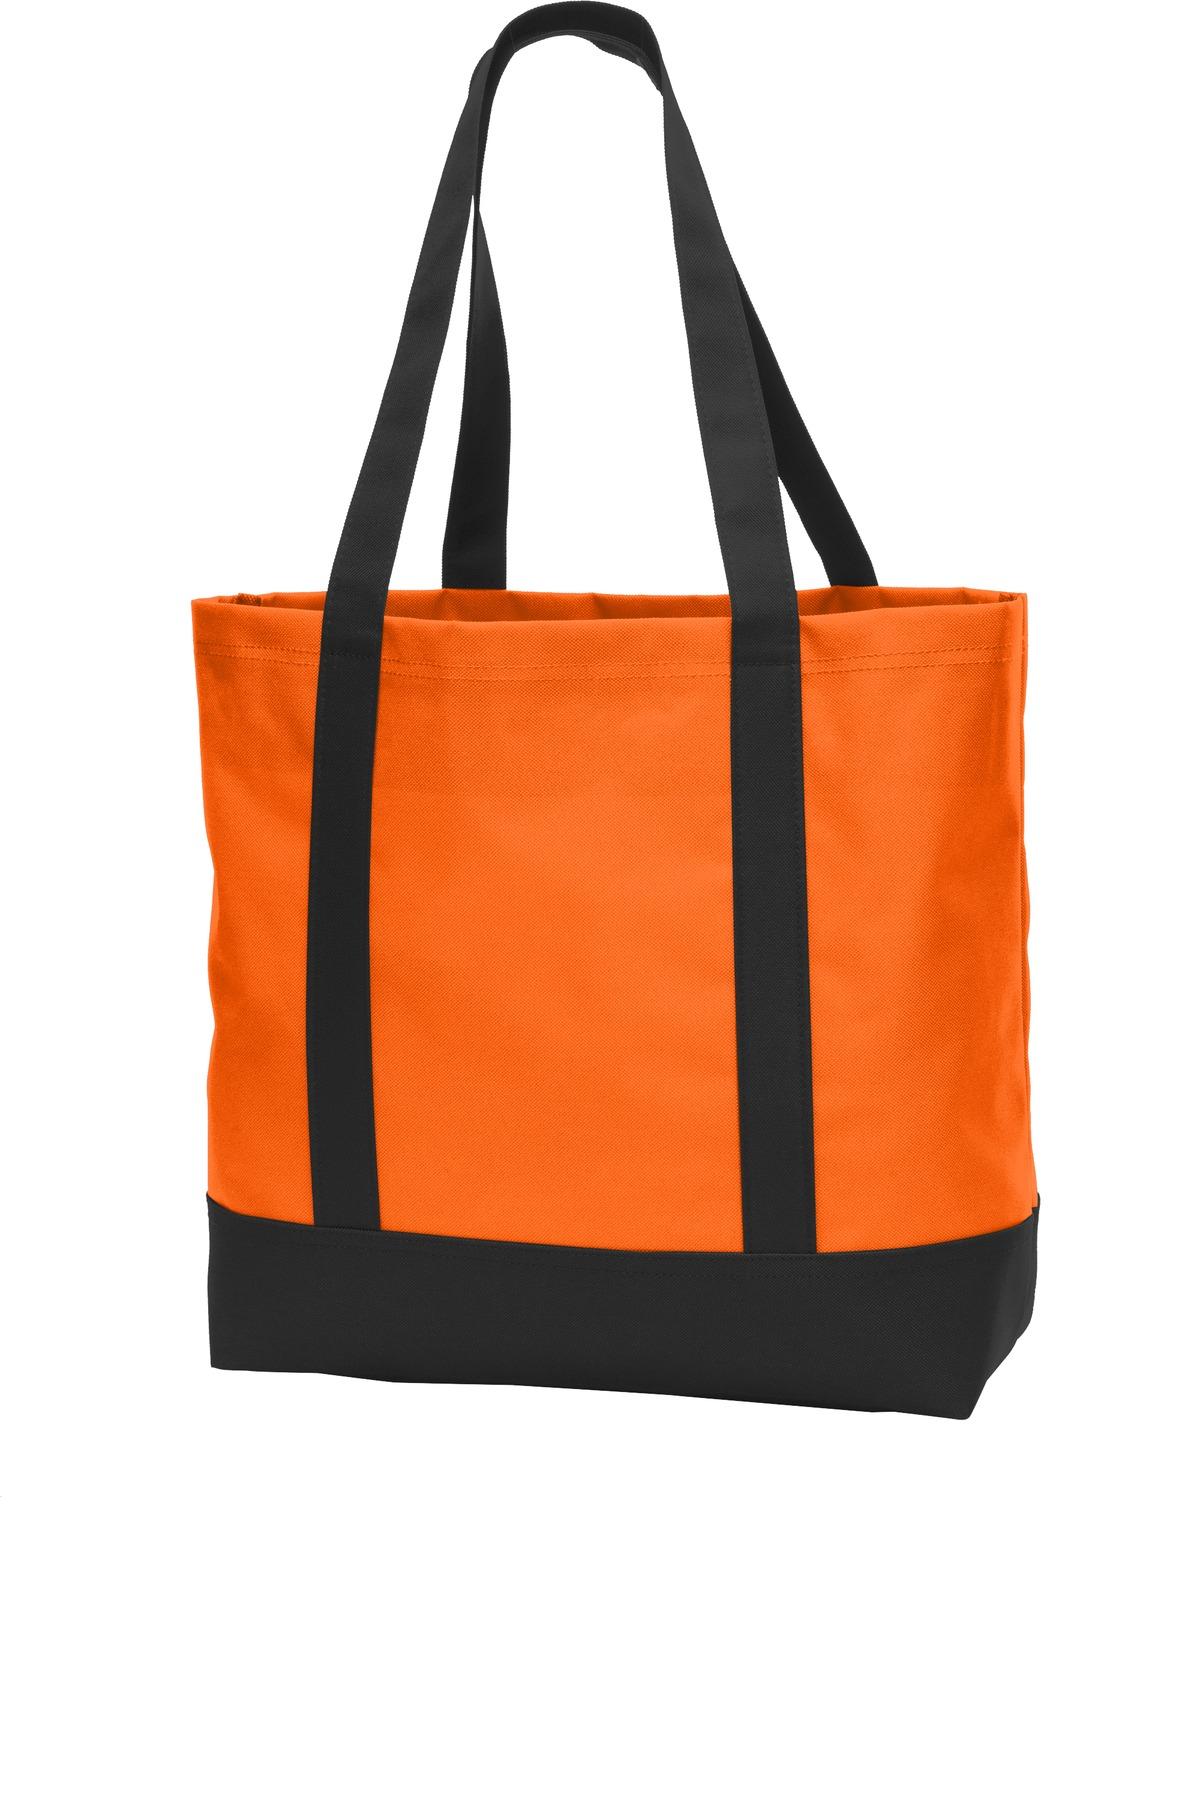 click to view Neon Orange/ Black